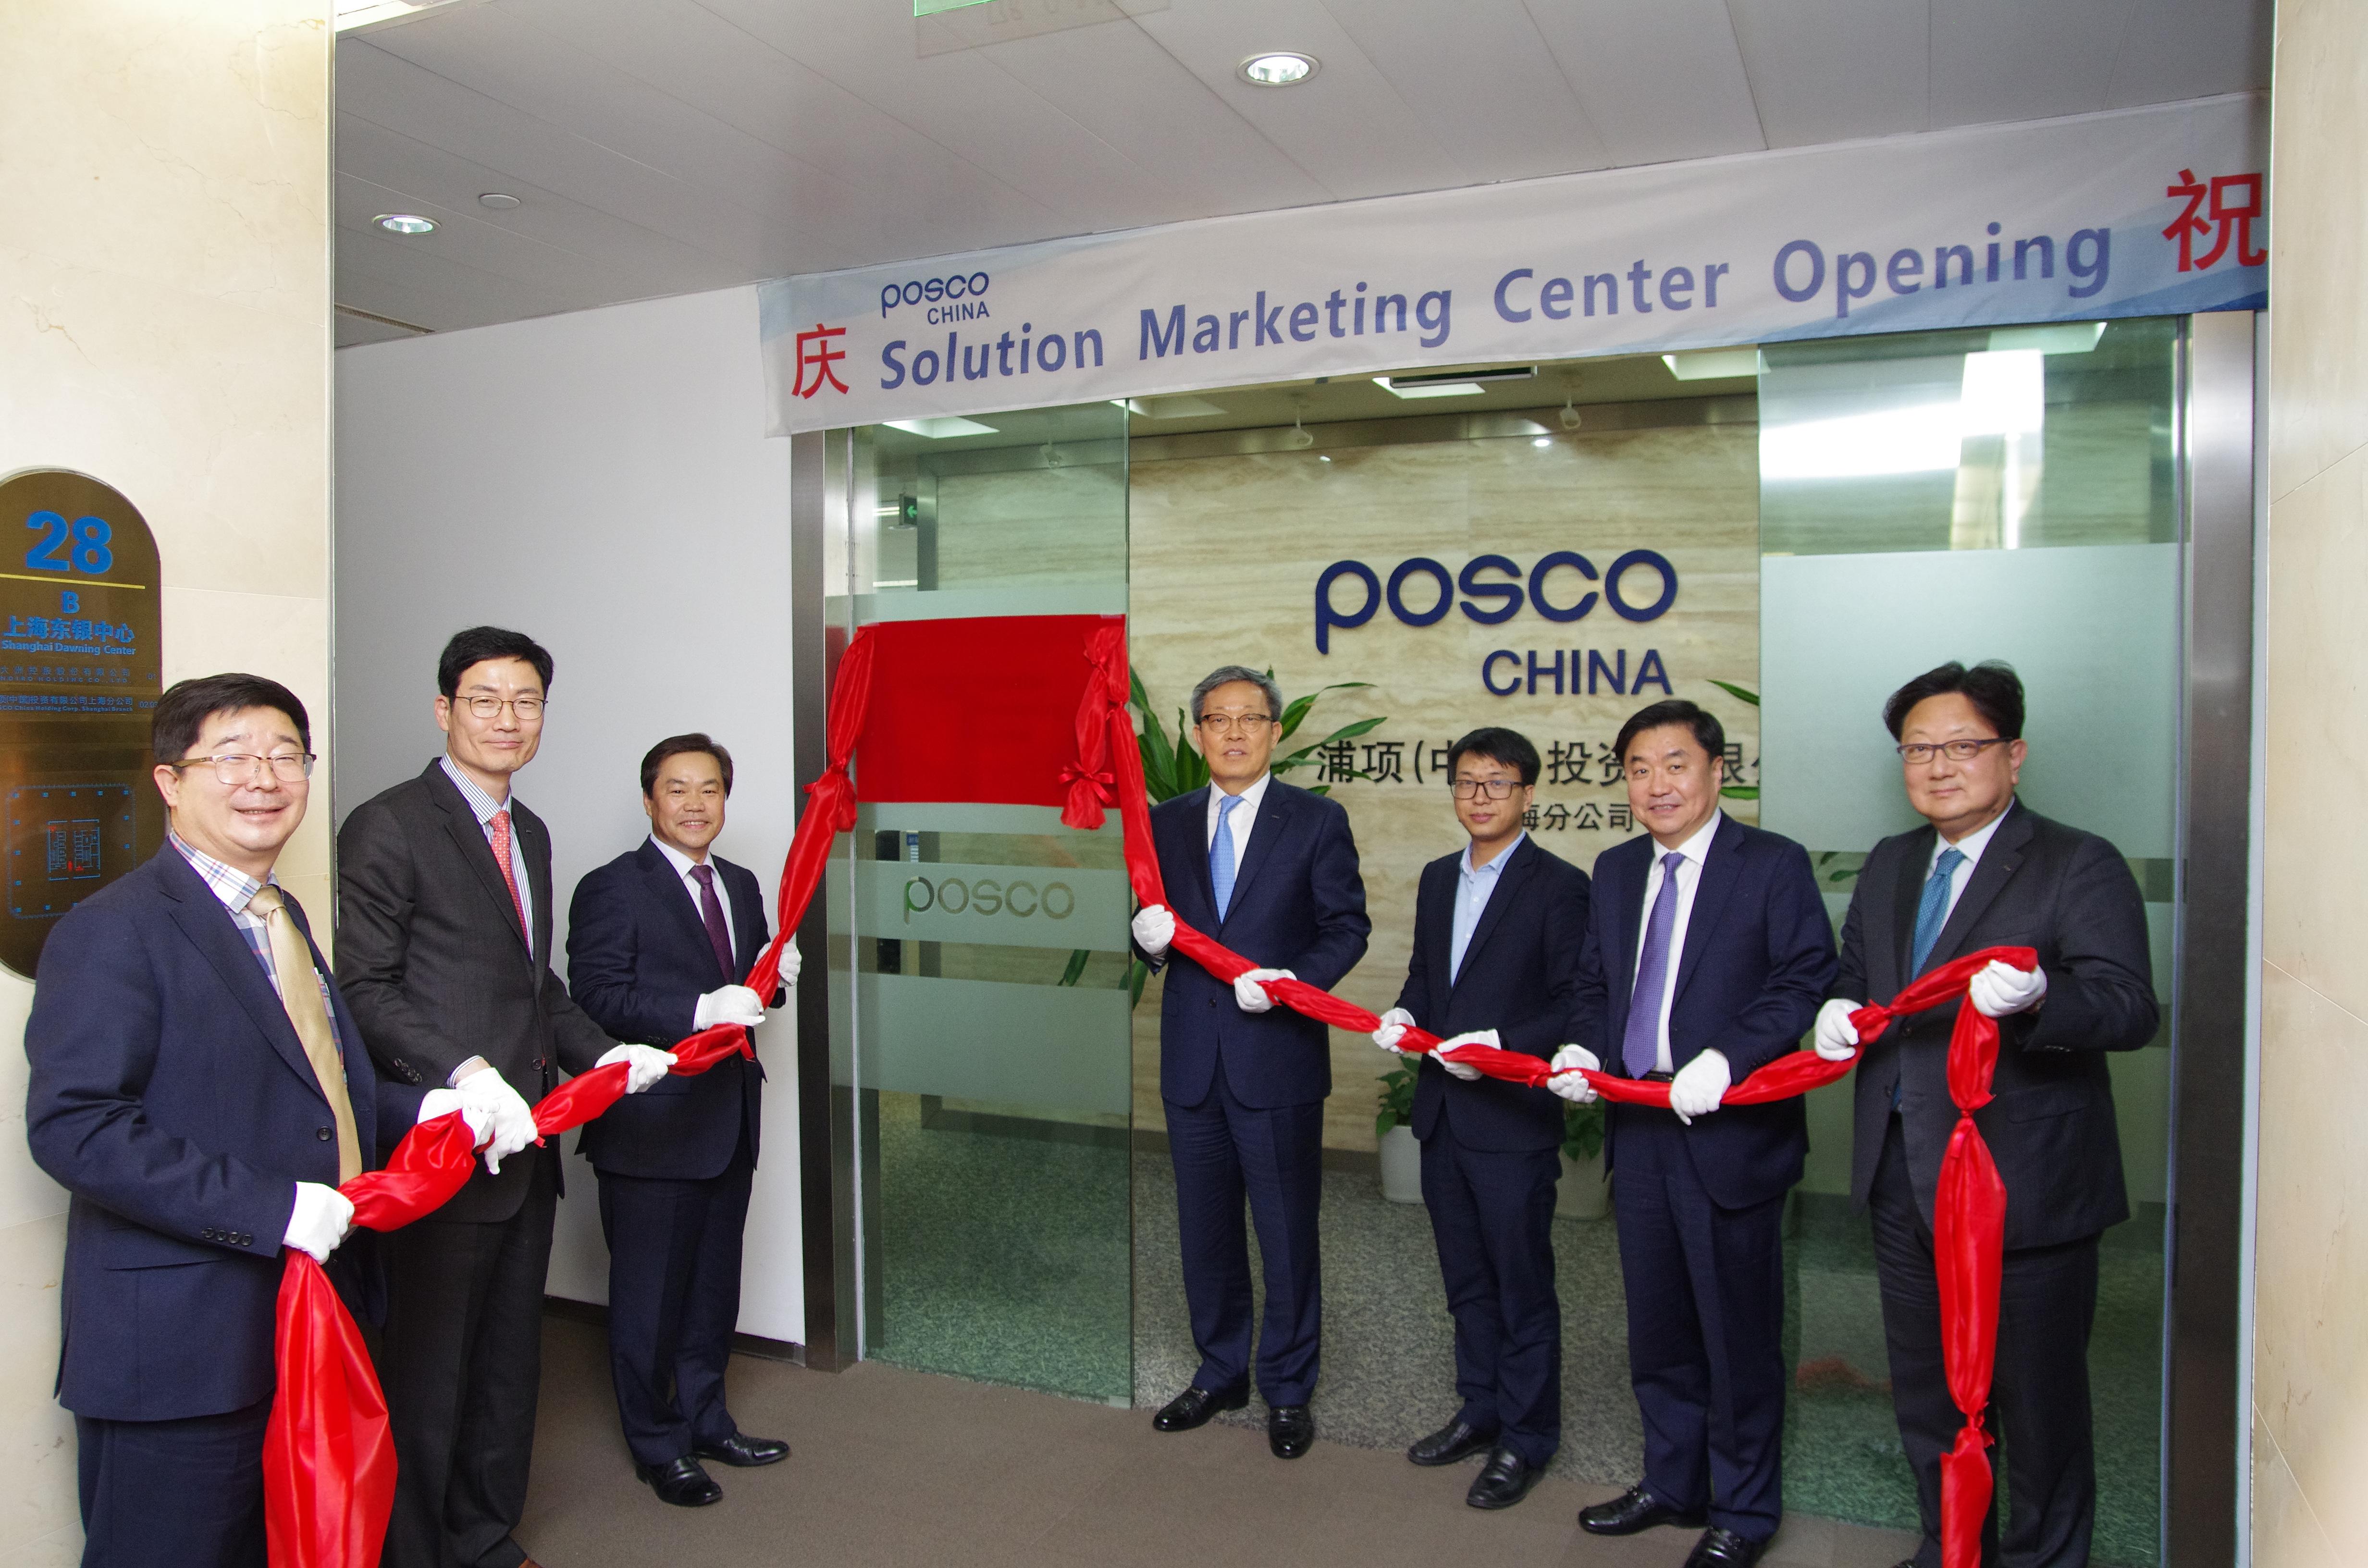 Establishment of Solution center in China